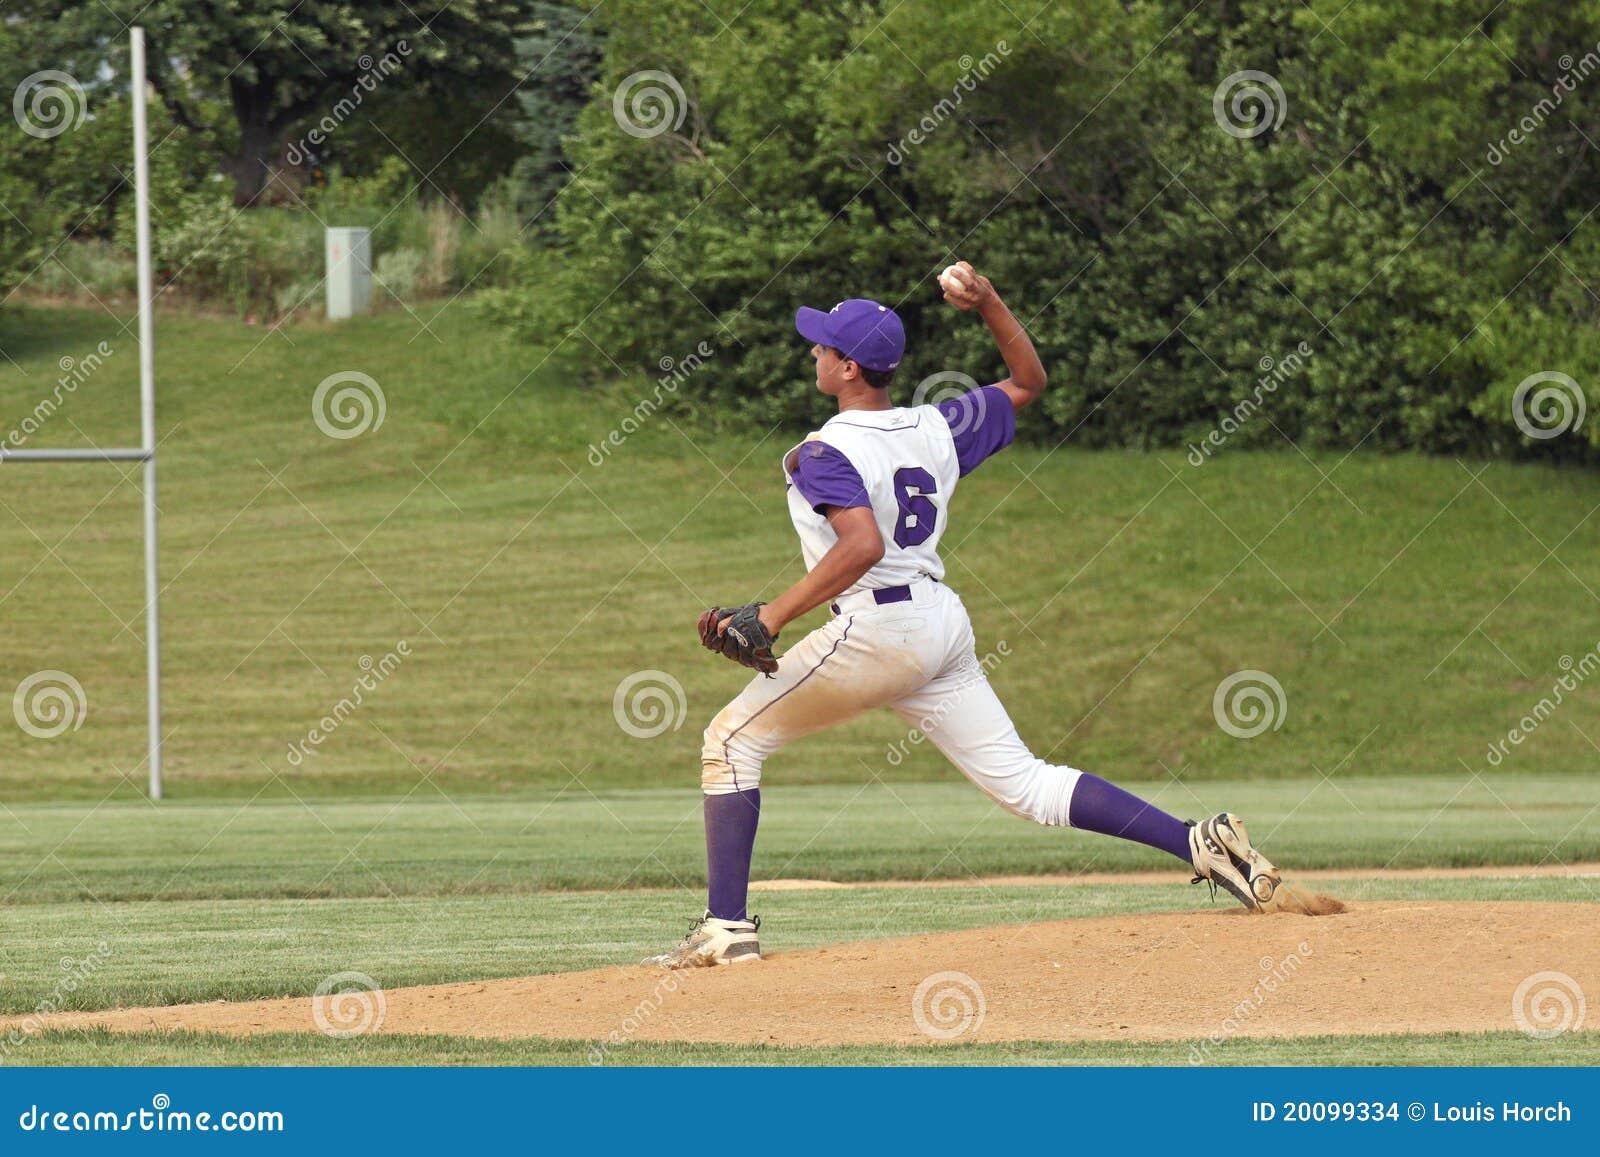 High School Baseball Editorial Stock Image - Image: 20099334